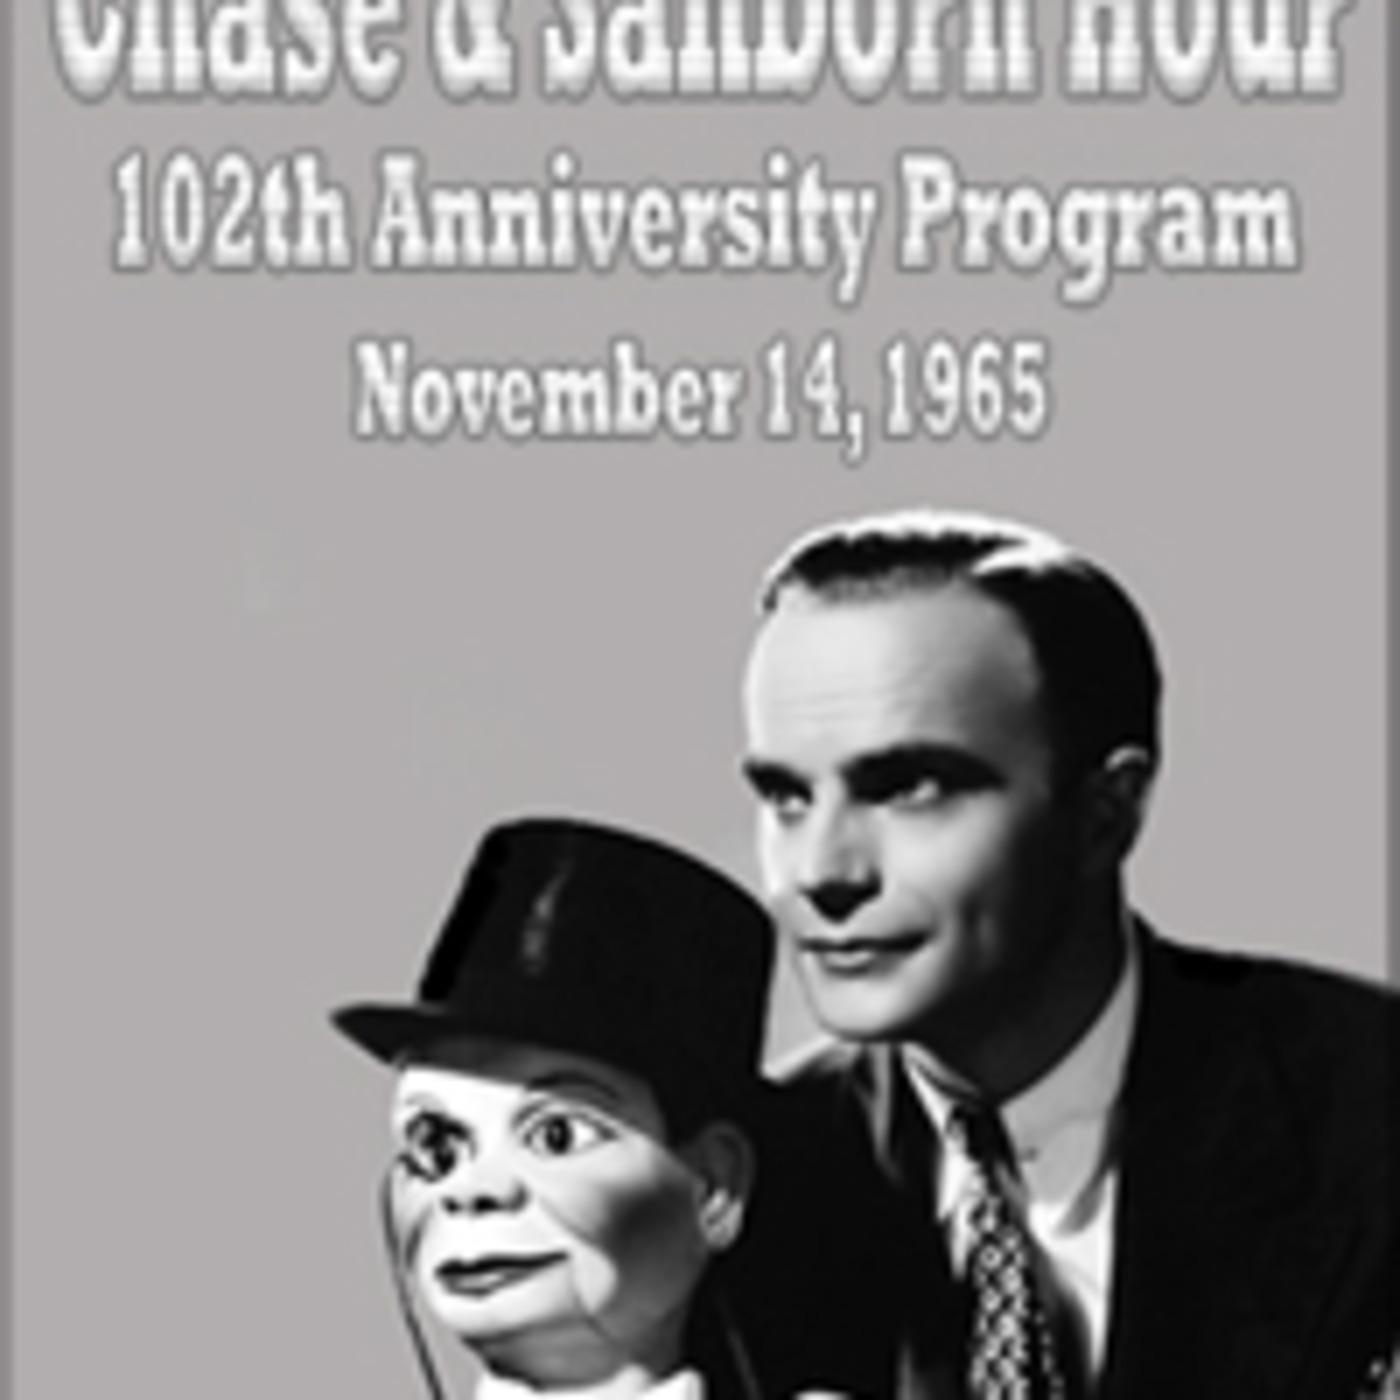 Chase & Sanborn Hour - 102th Anniversity Program (11-14-65)